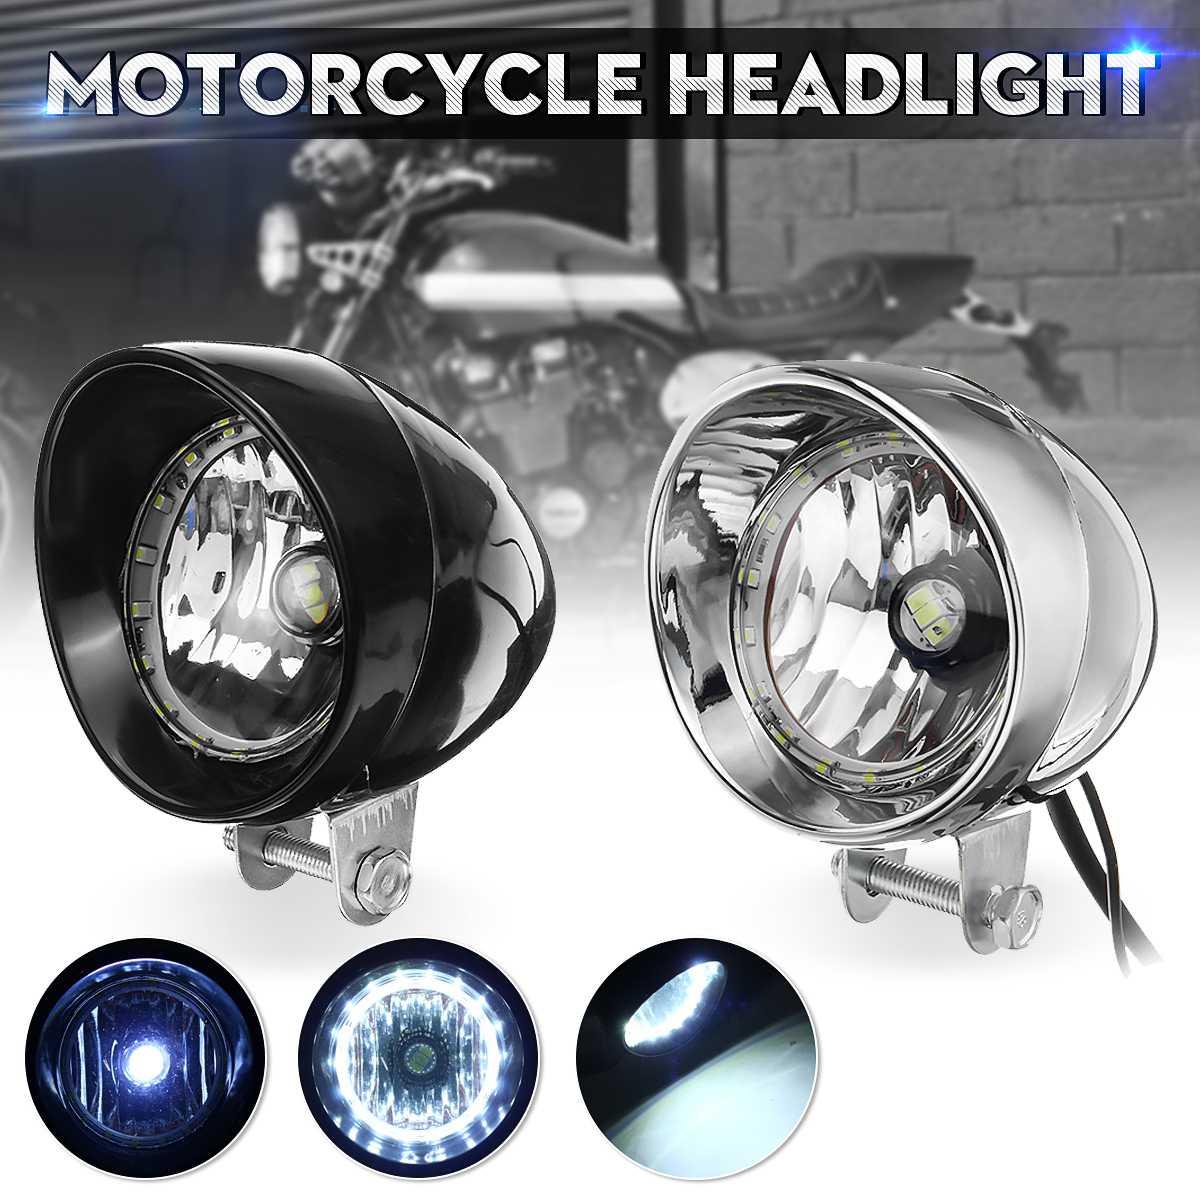 Black Chrome LED Motorcycle Universal Bullet Headlights High/Low Beam Head Light Lamp